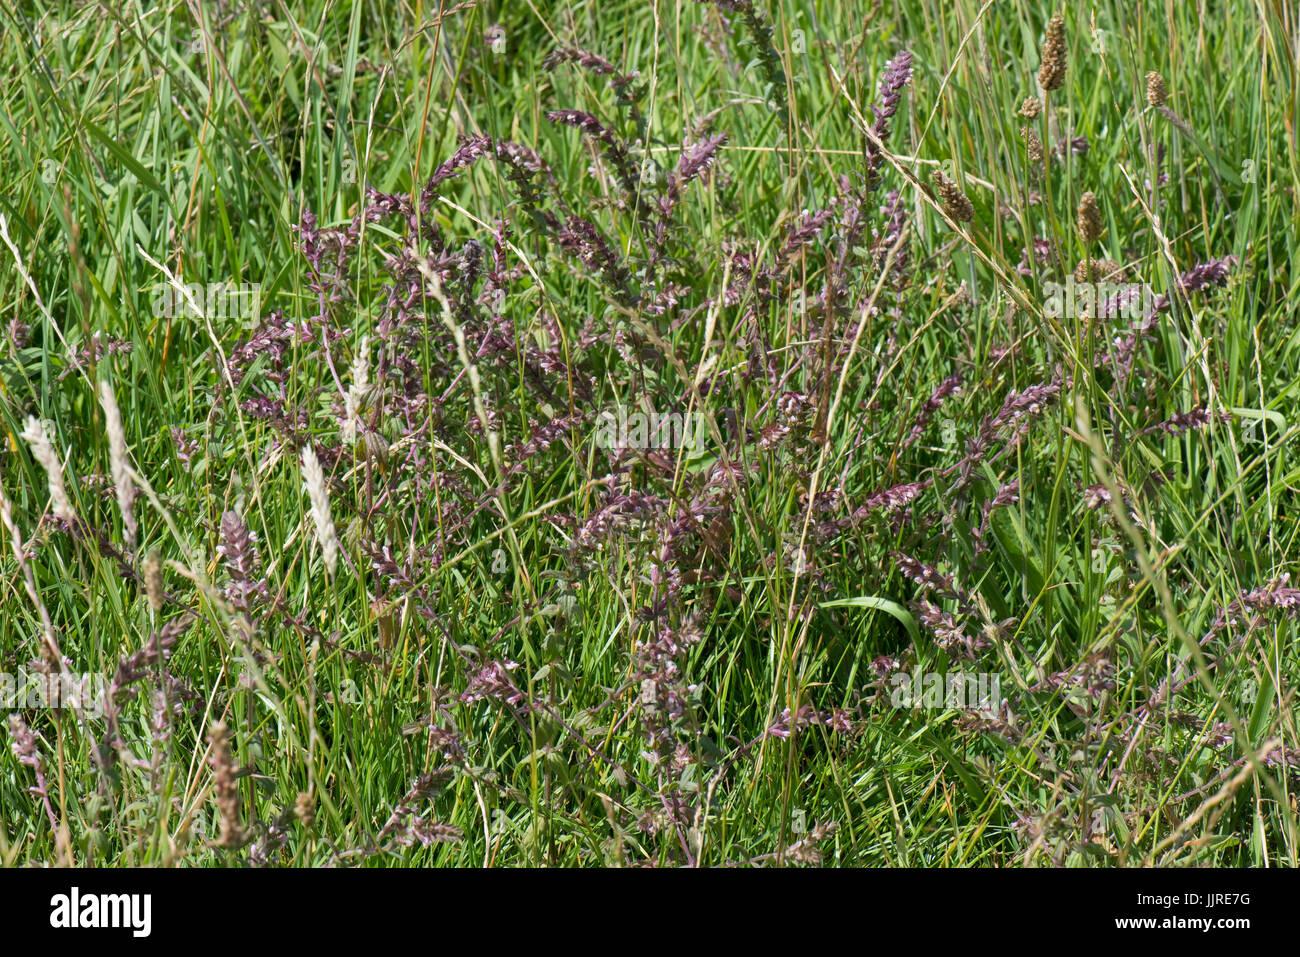 Red bartsia, Odontites vernus, flowering hemiparasite in grassland, Berkshire, July - Stock Image